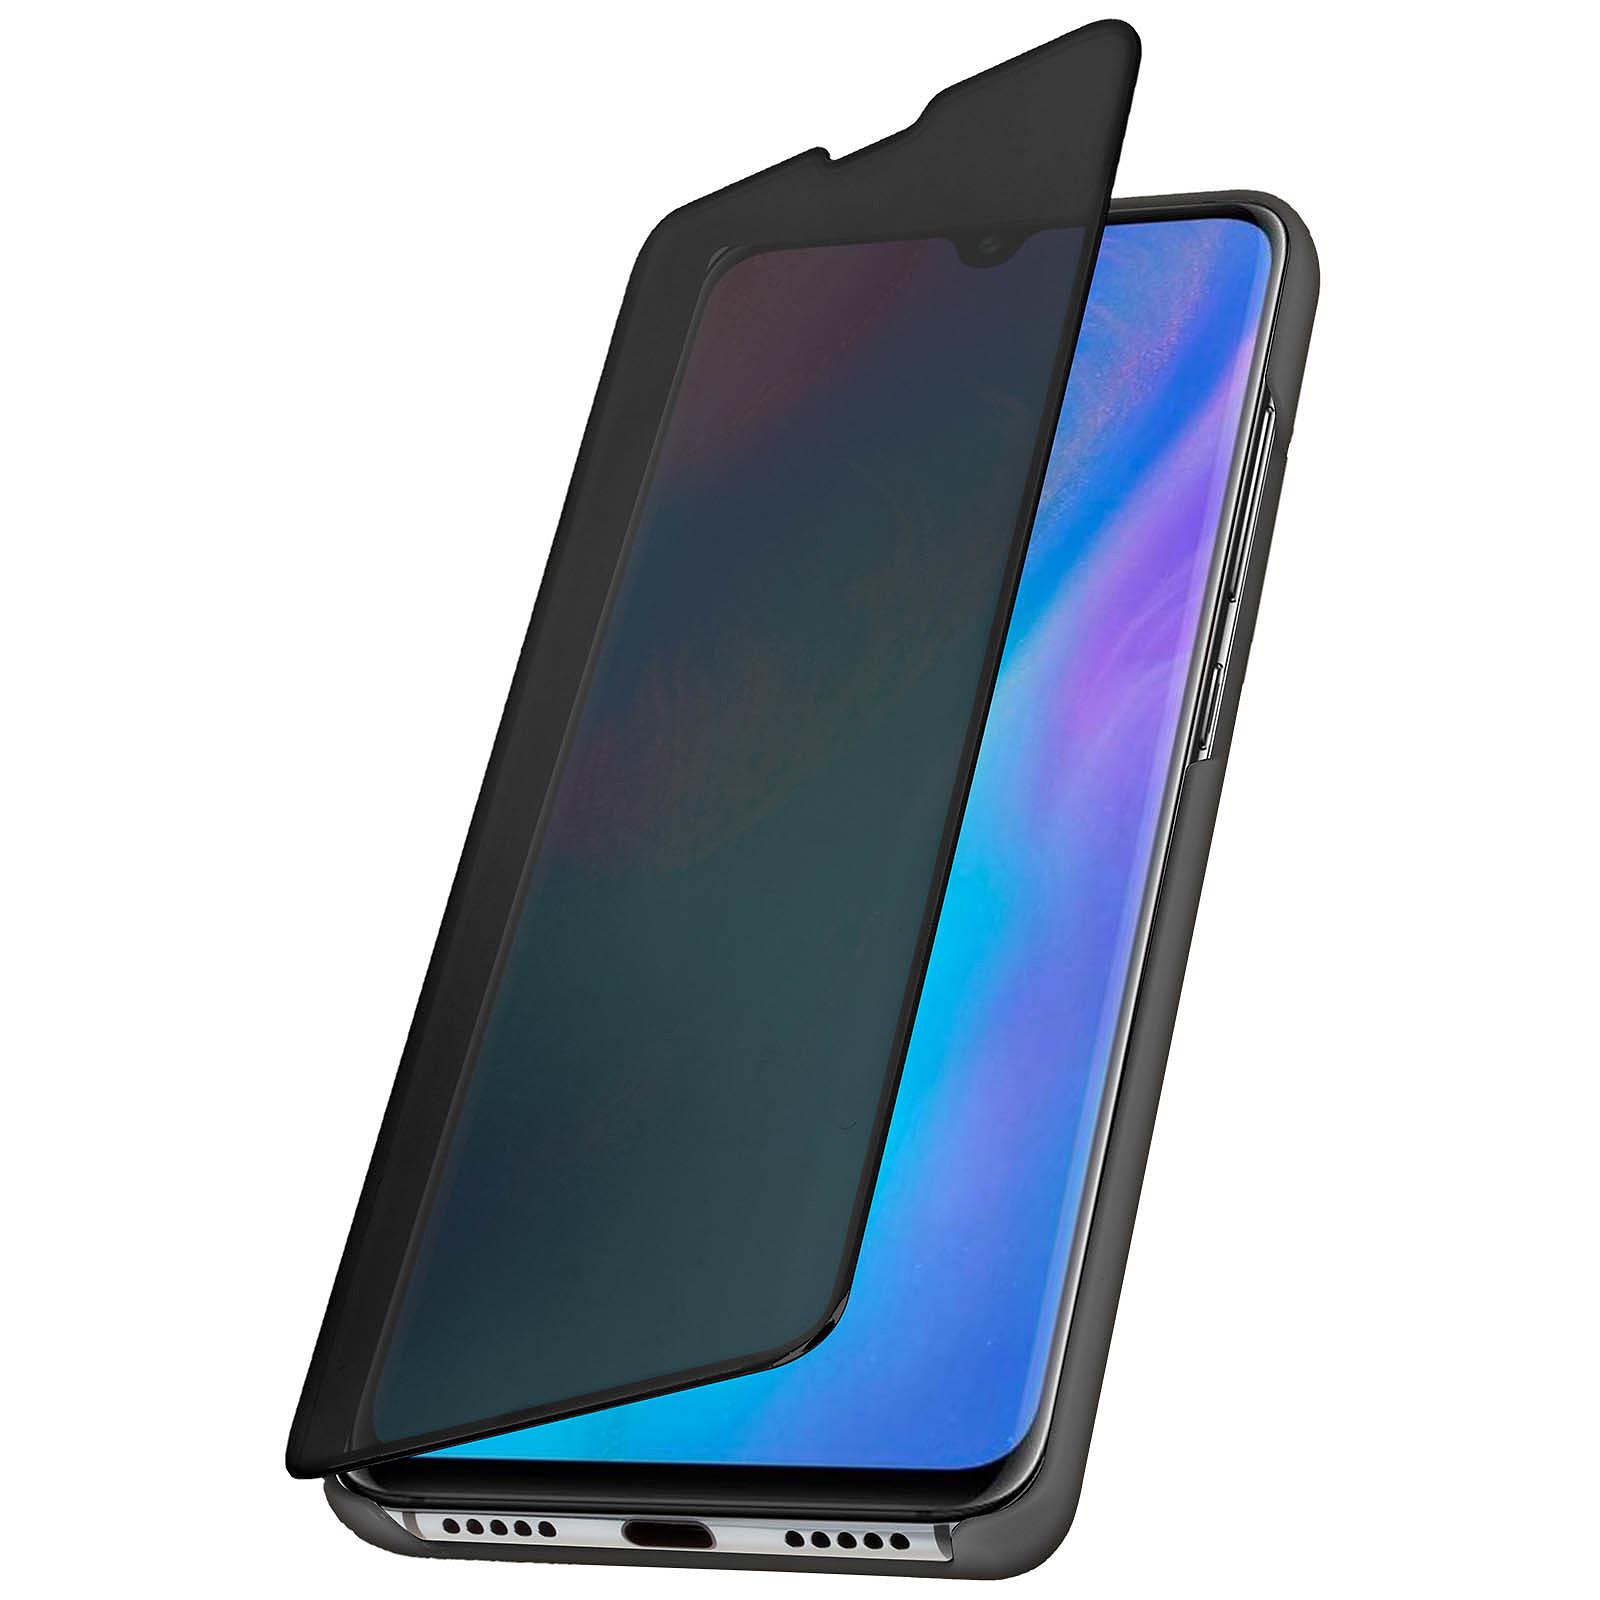 Avizar Etui folio Noir pour Huawei P30 Pro